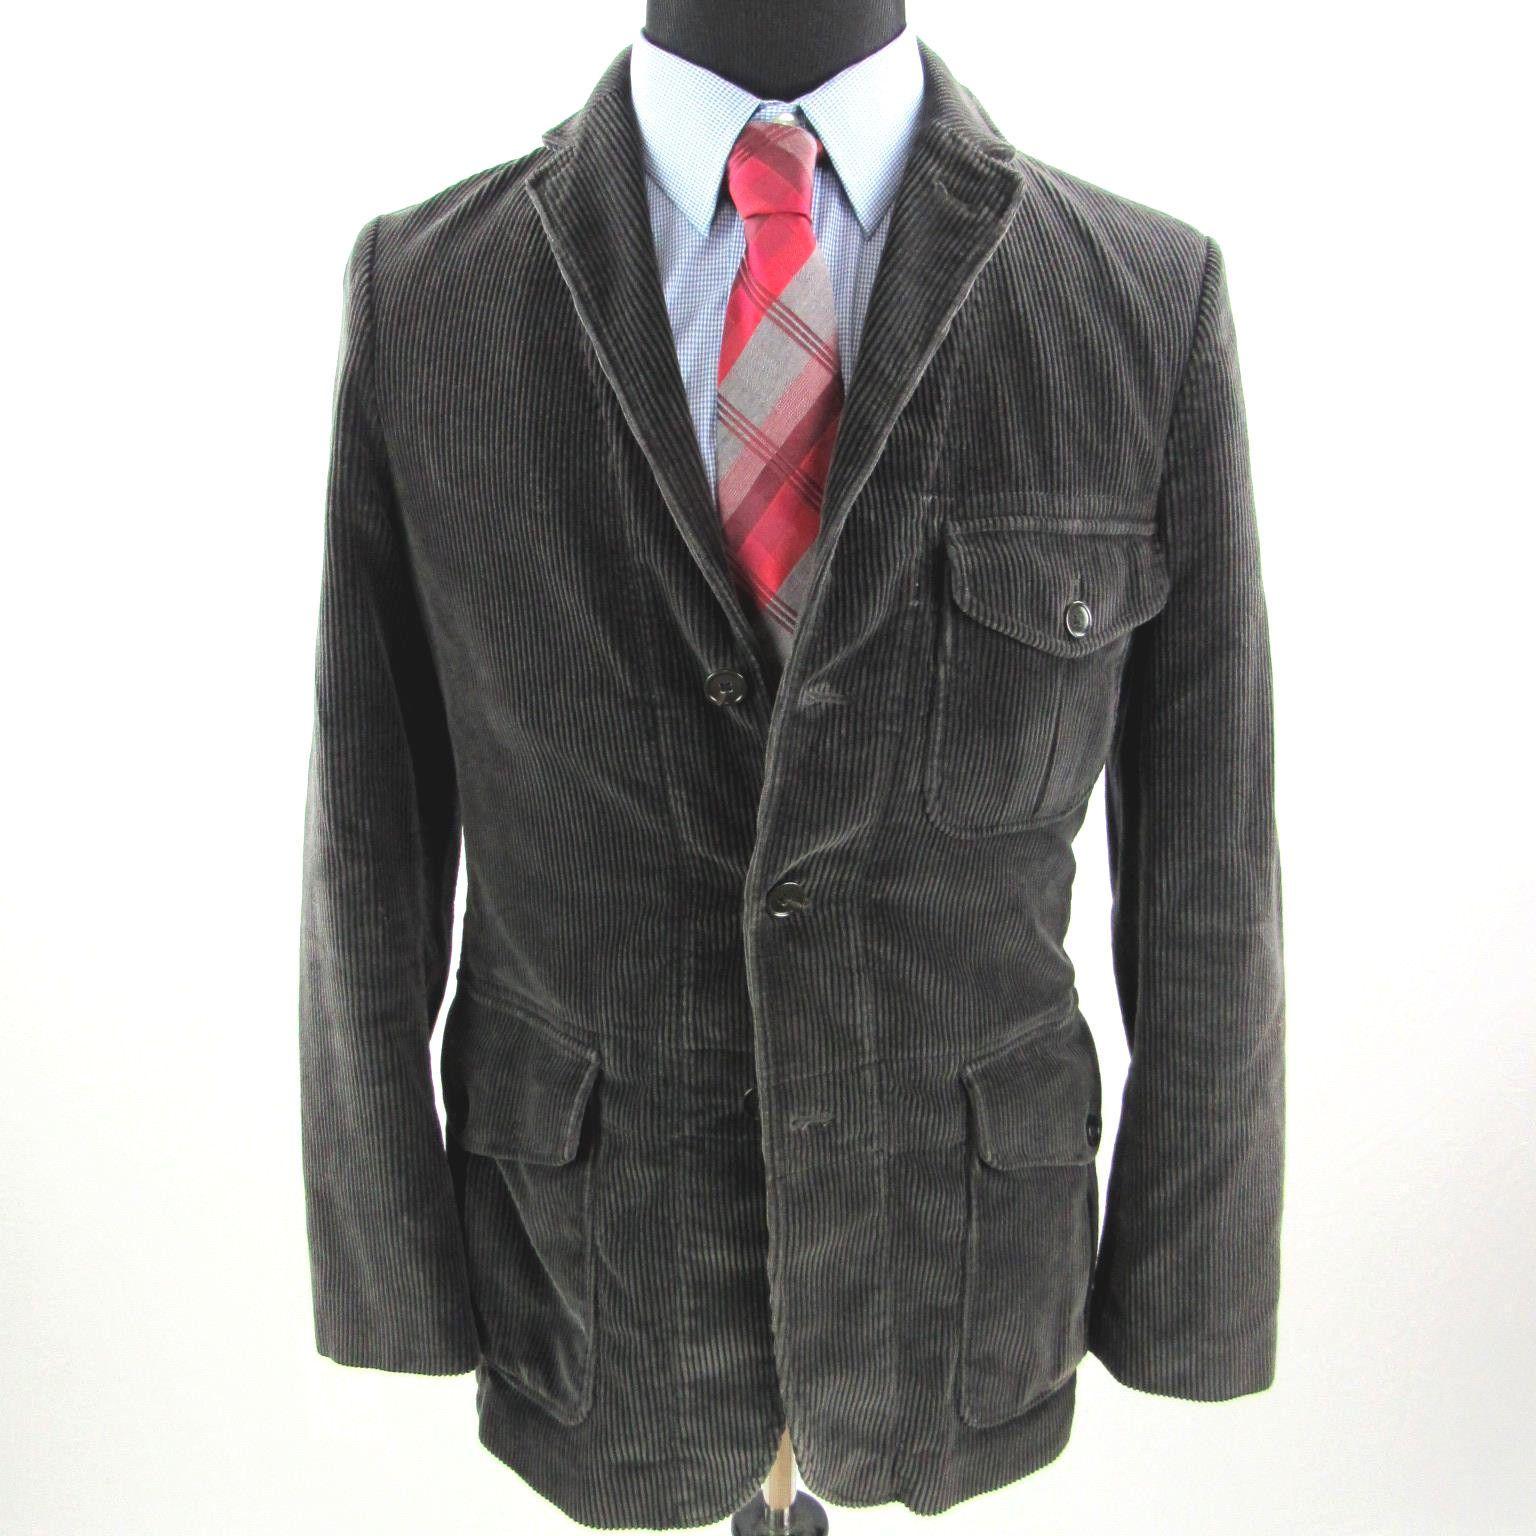 J Crew Ludlow Sport Coat Blazer Mens Small Black Gray